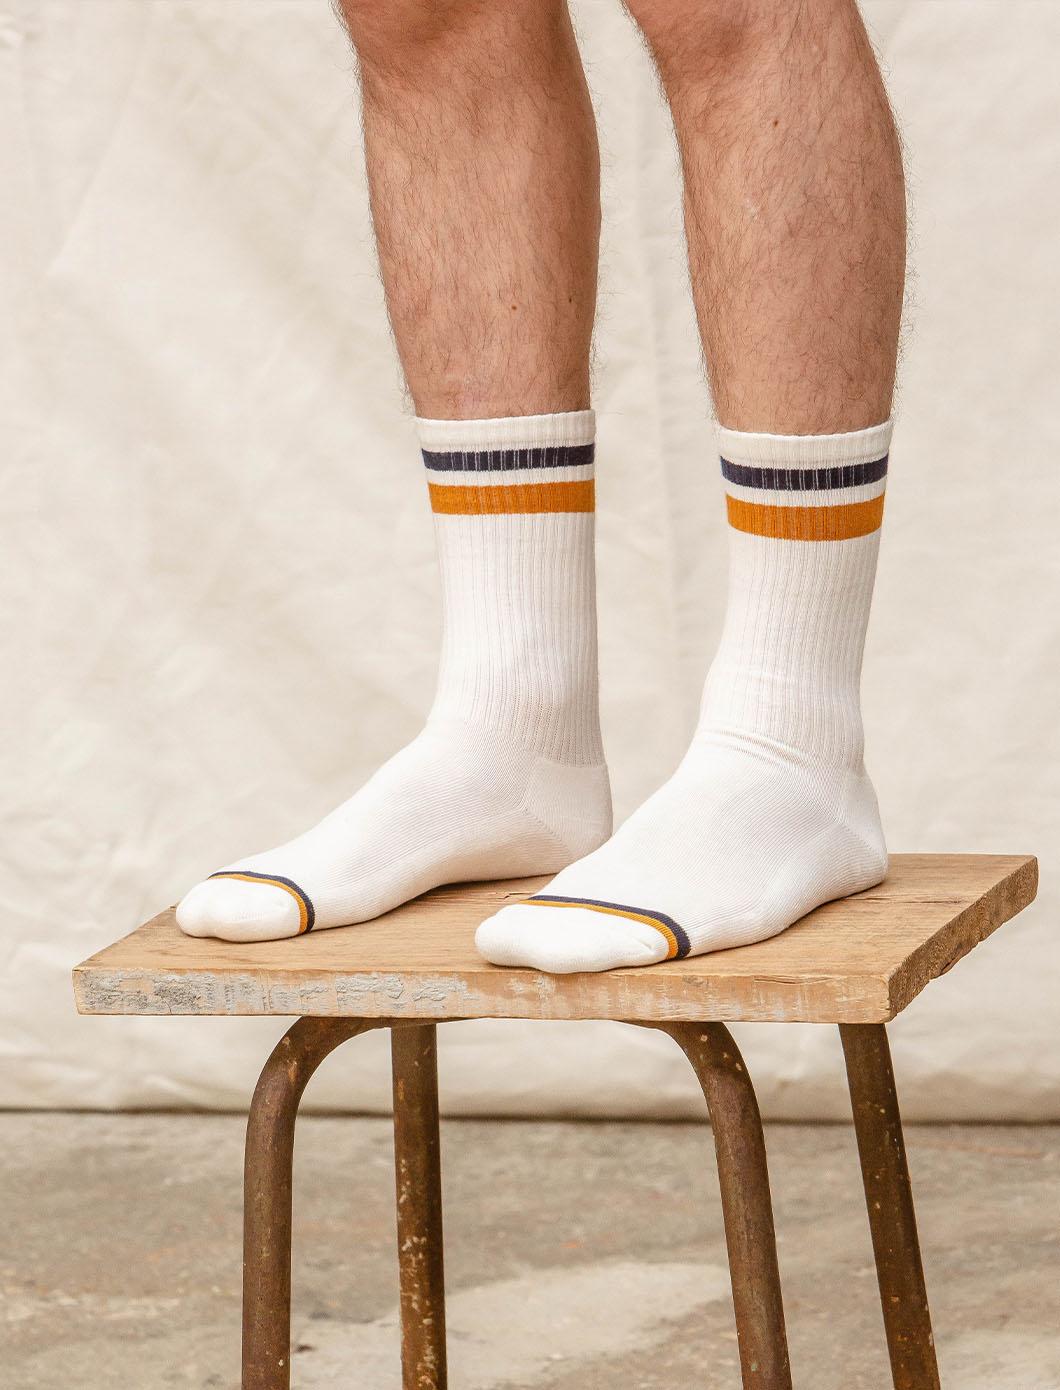 Ribbed Sport Socks - White, Navy and Mustard